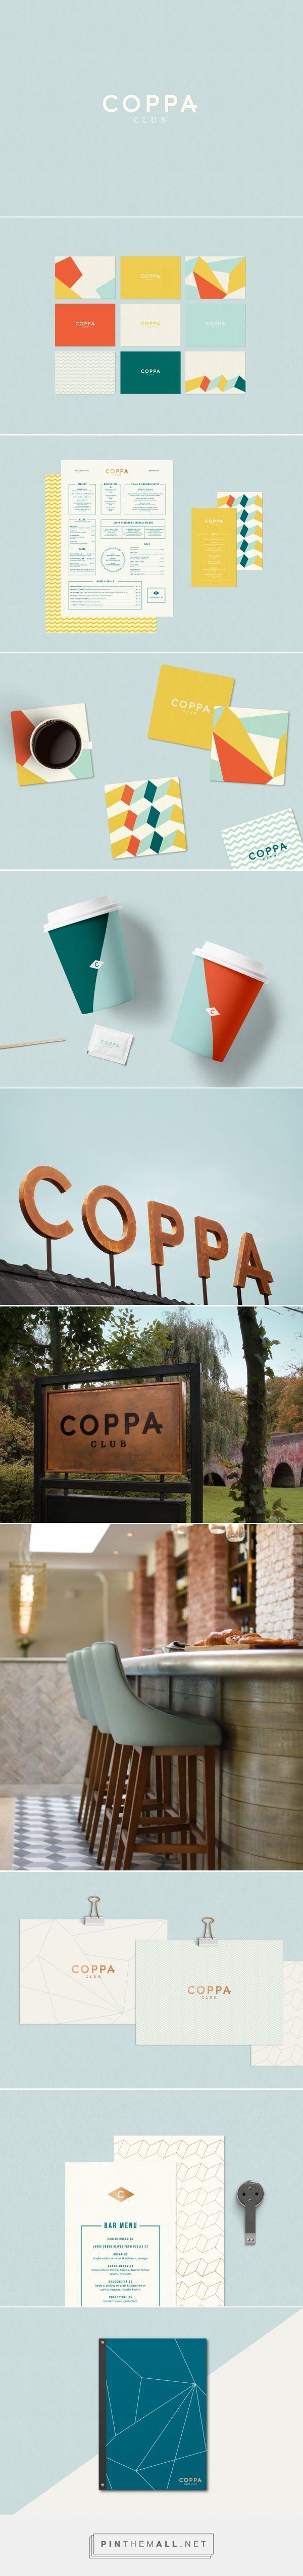 Coppa Club Branding by The Plant | Fivestar Branding – Design and Branding…